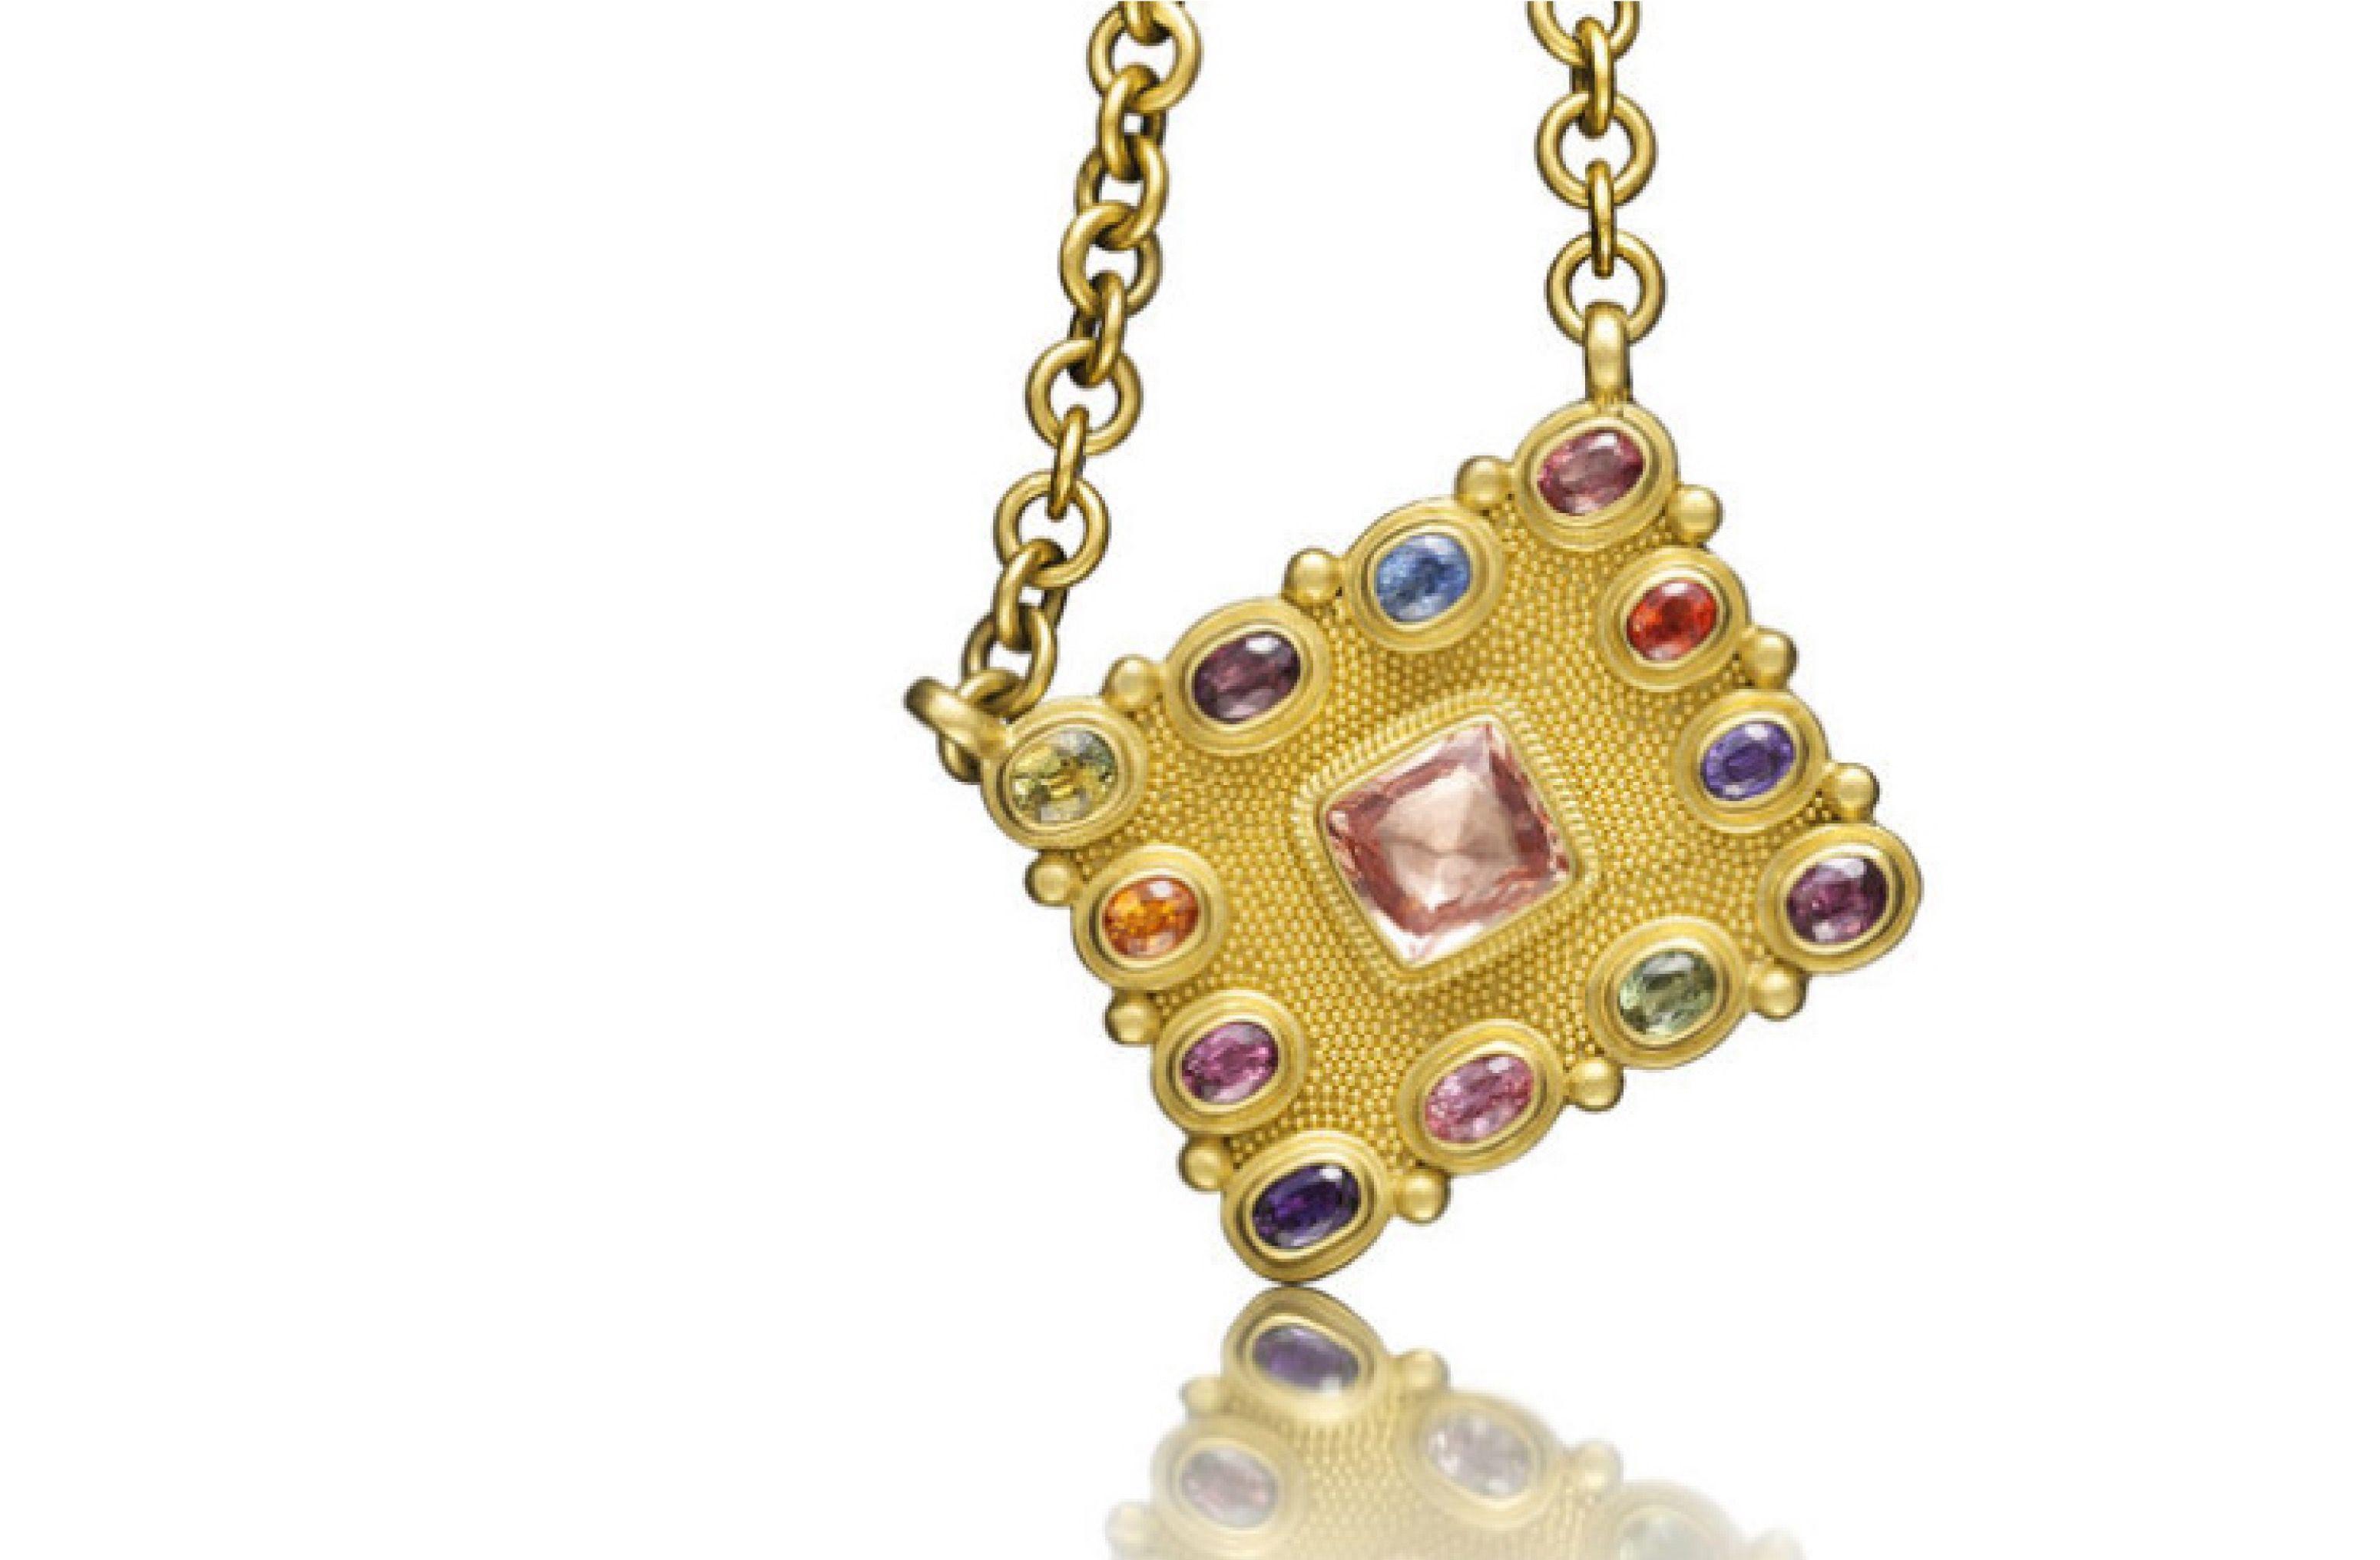 JewelryWhite_04.jpg